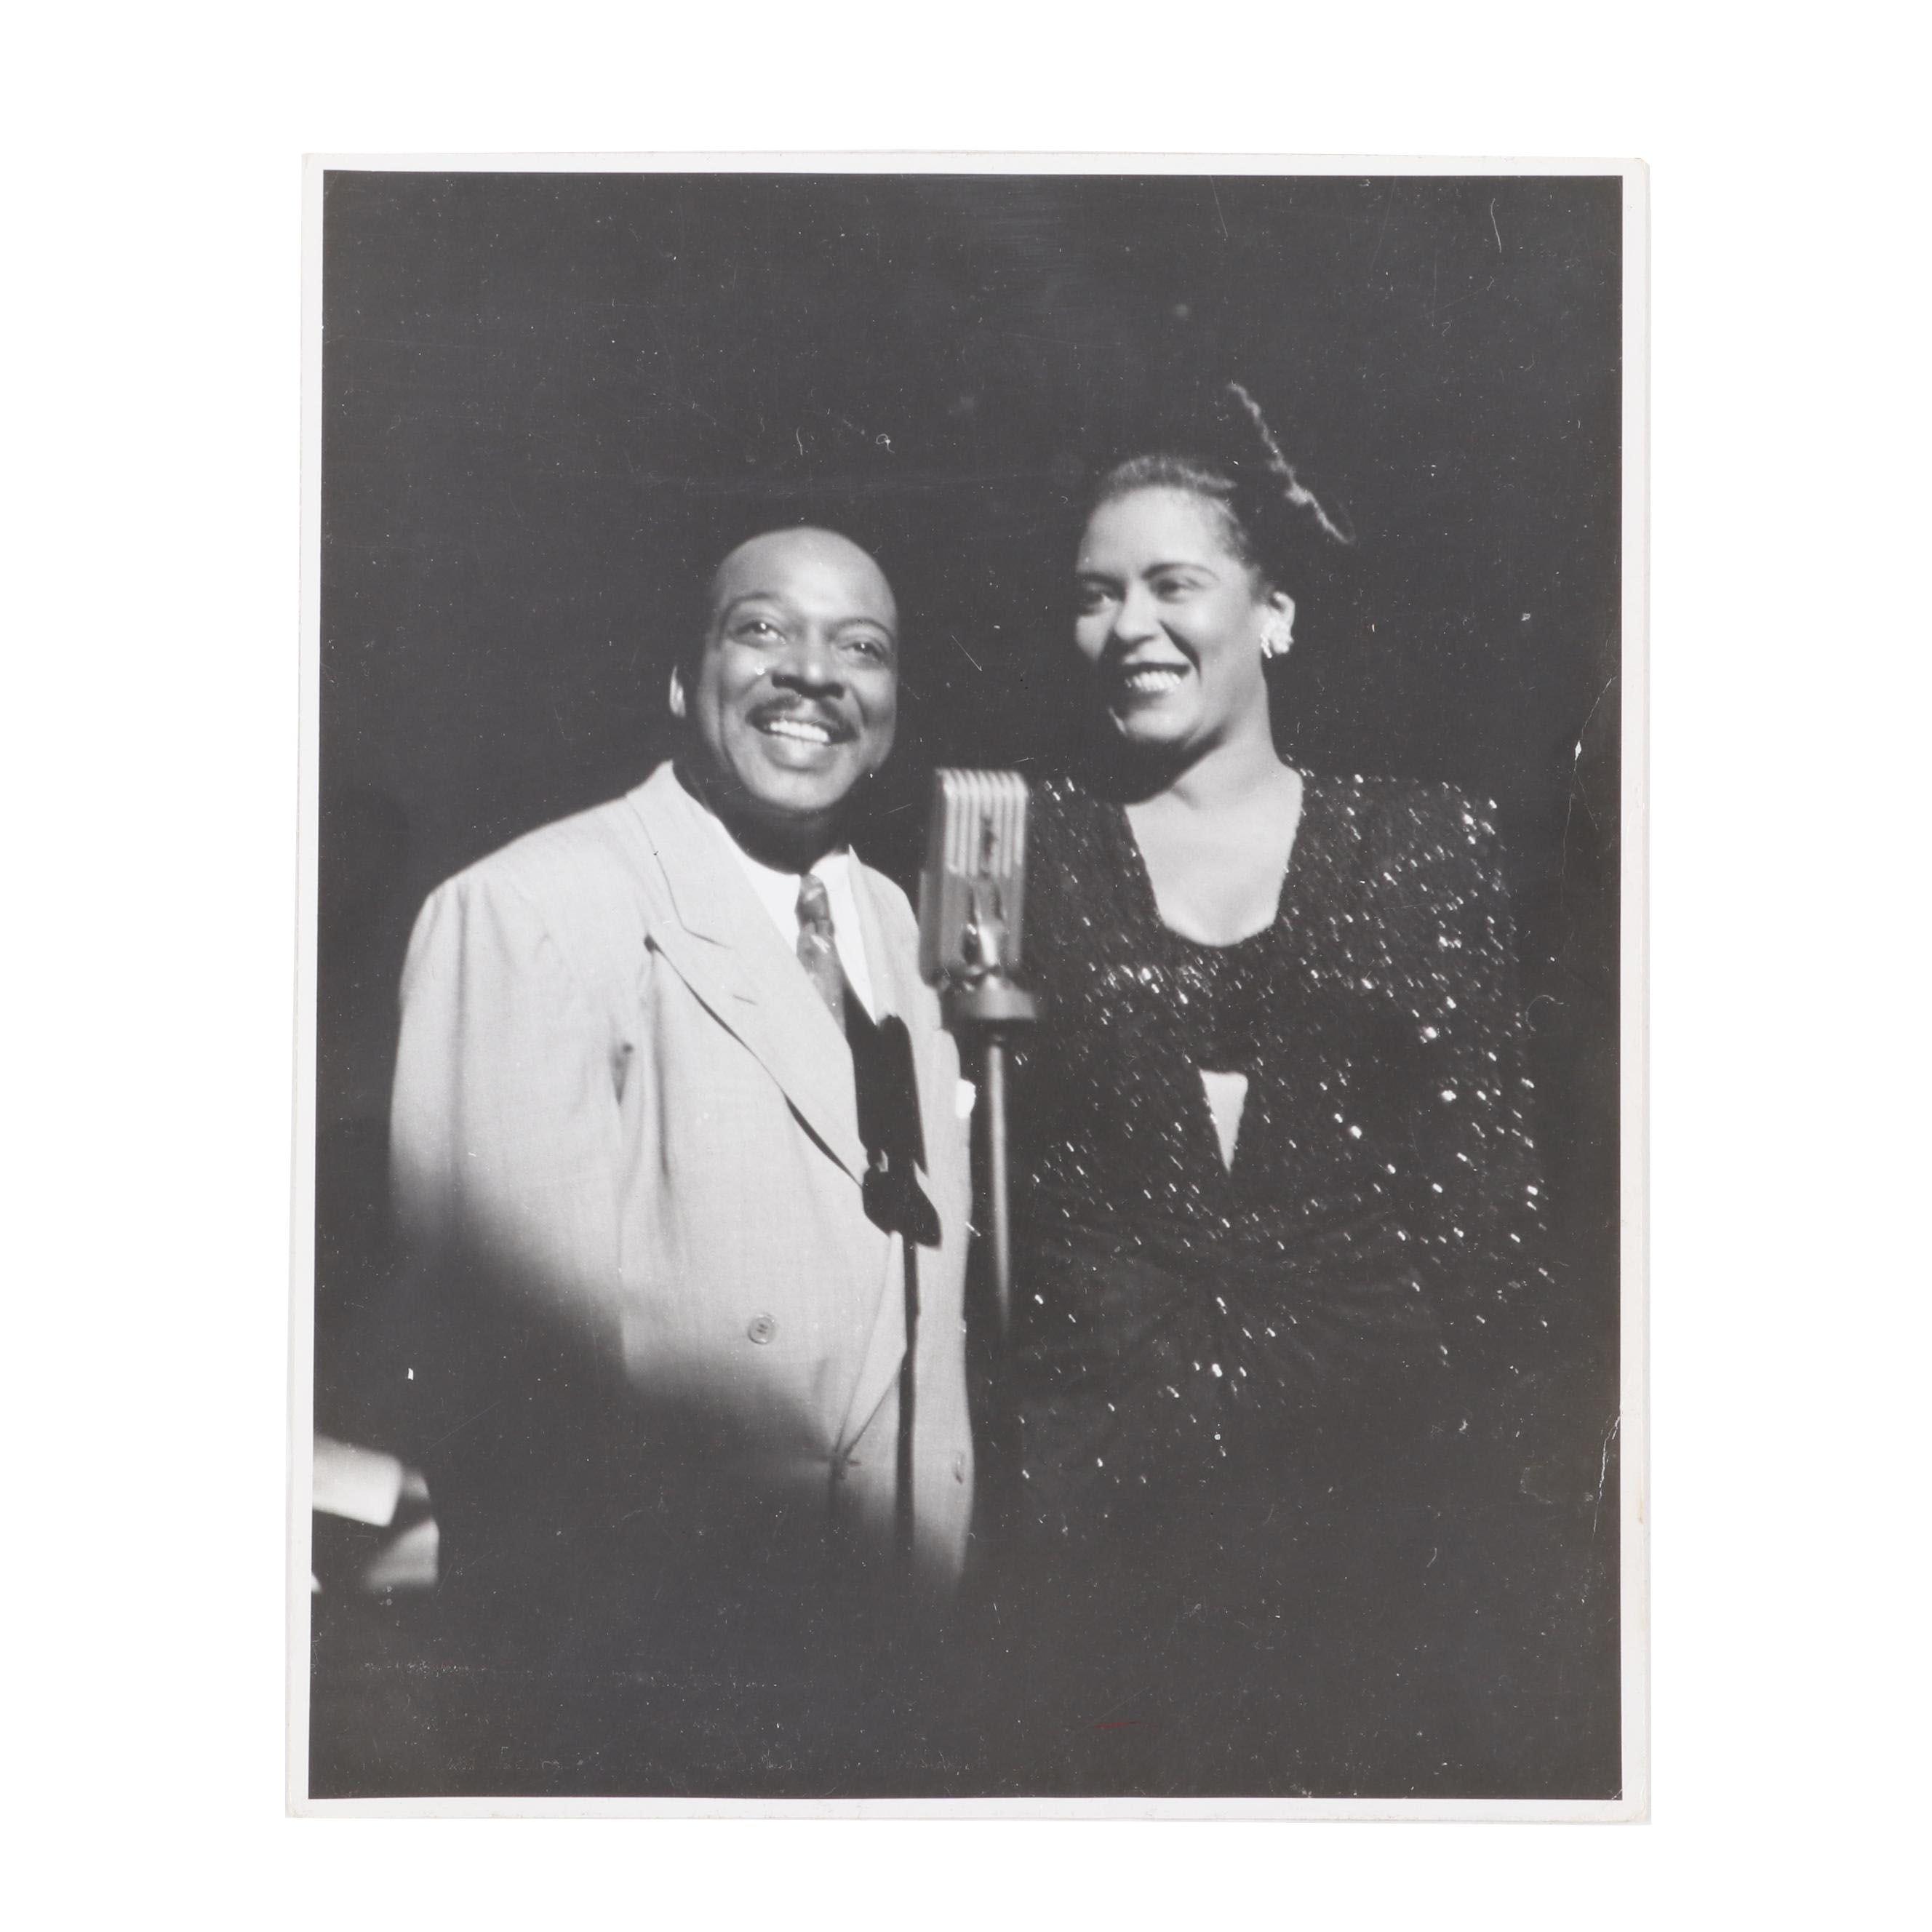 Billie Holiday & Count Basie Original 8x10 Stage Photo, Jack Bradley Estate